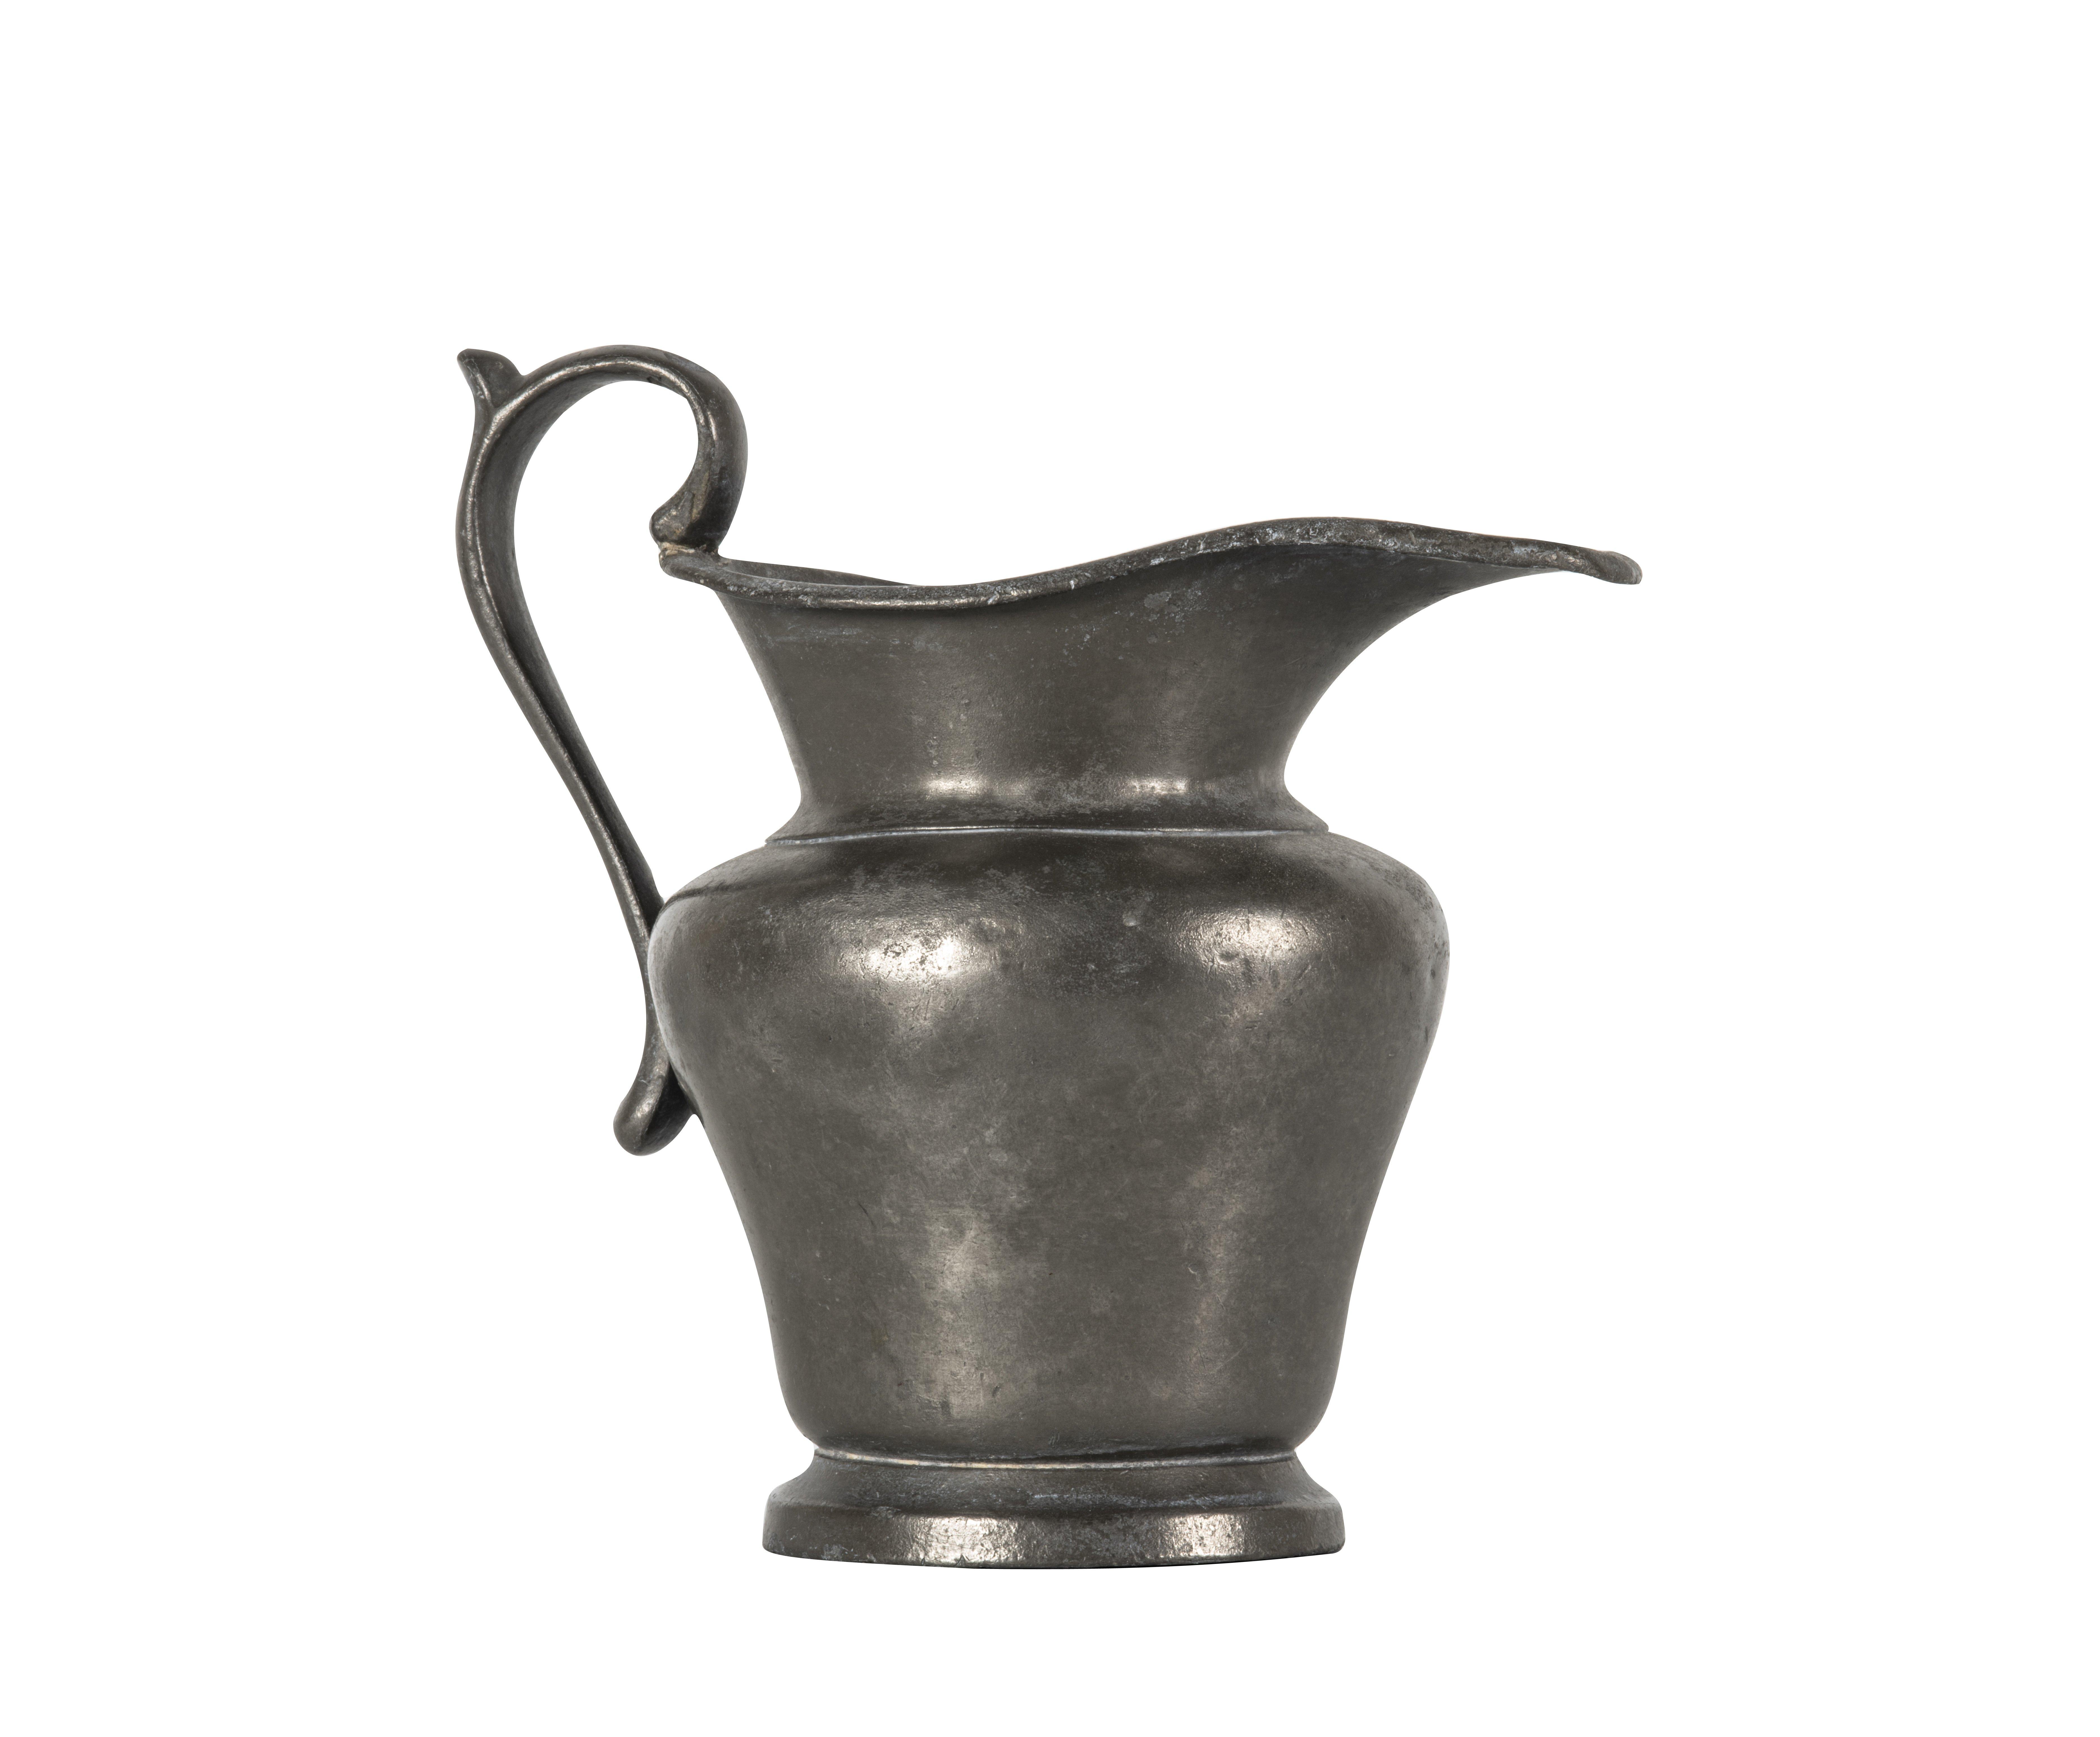 An Antique Pewter James Dixon Creamer 1447